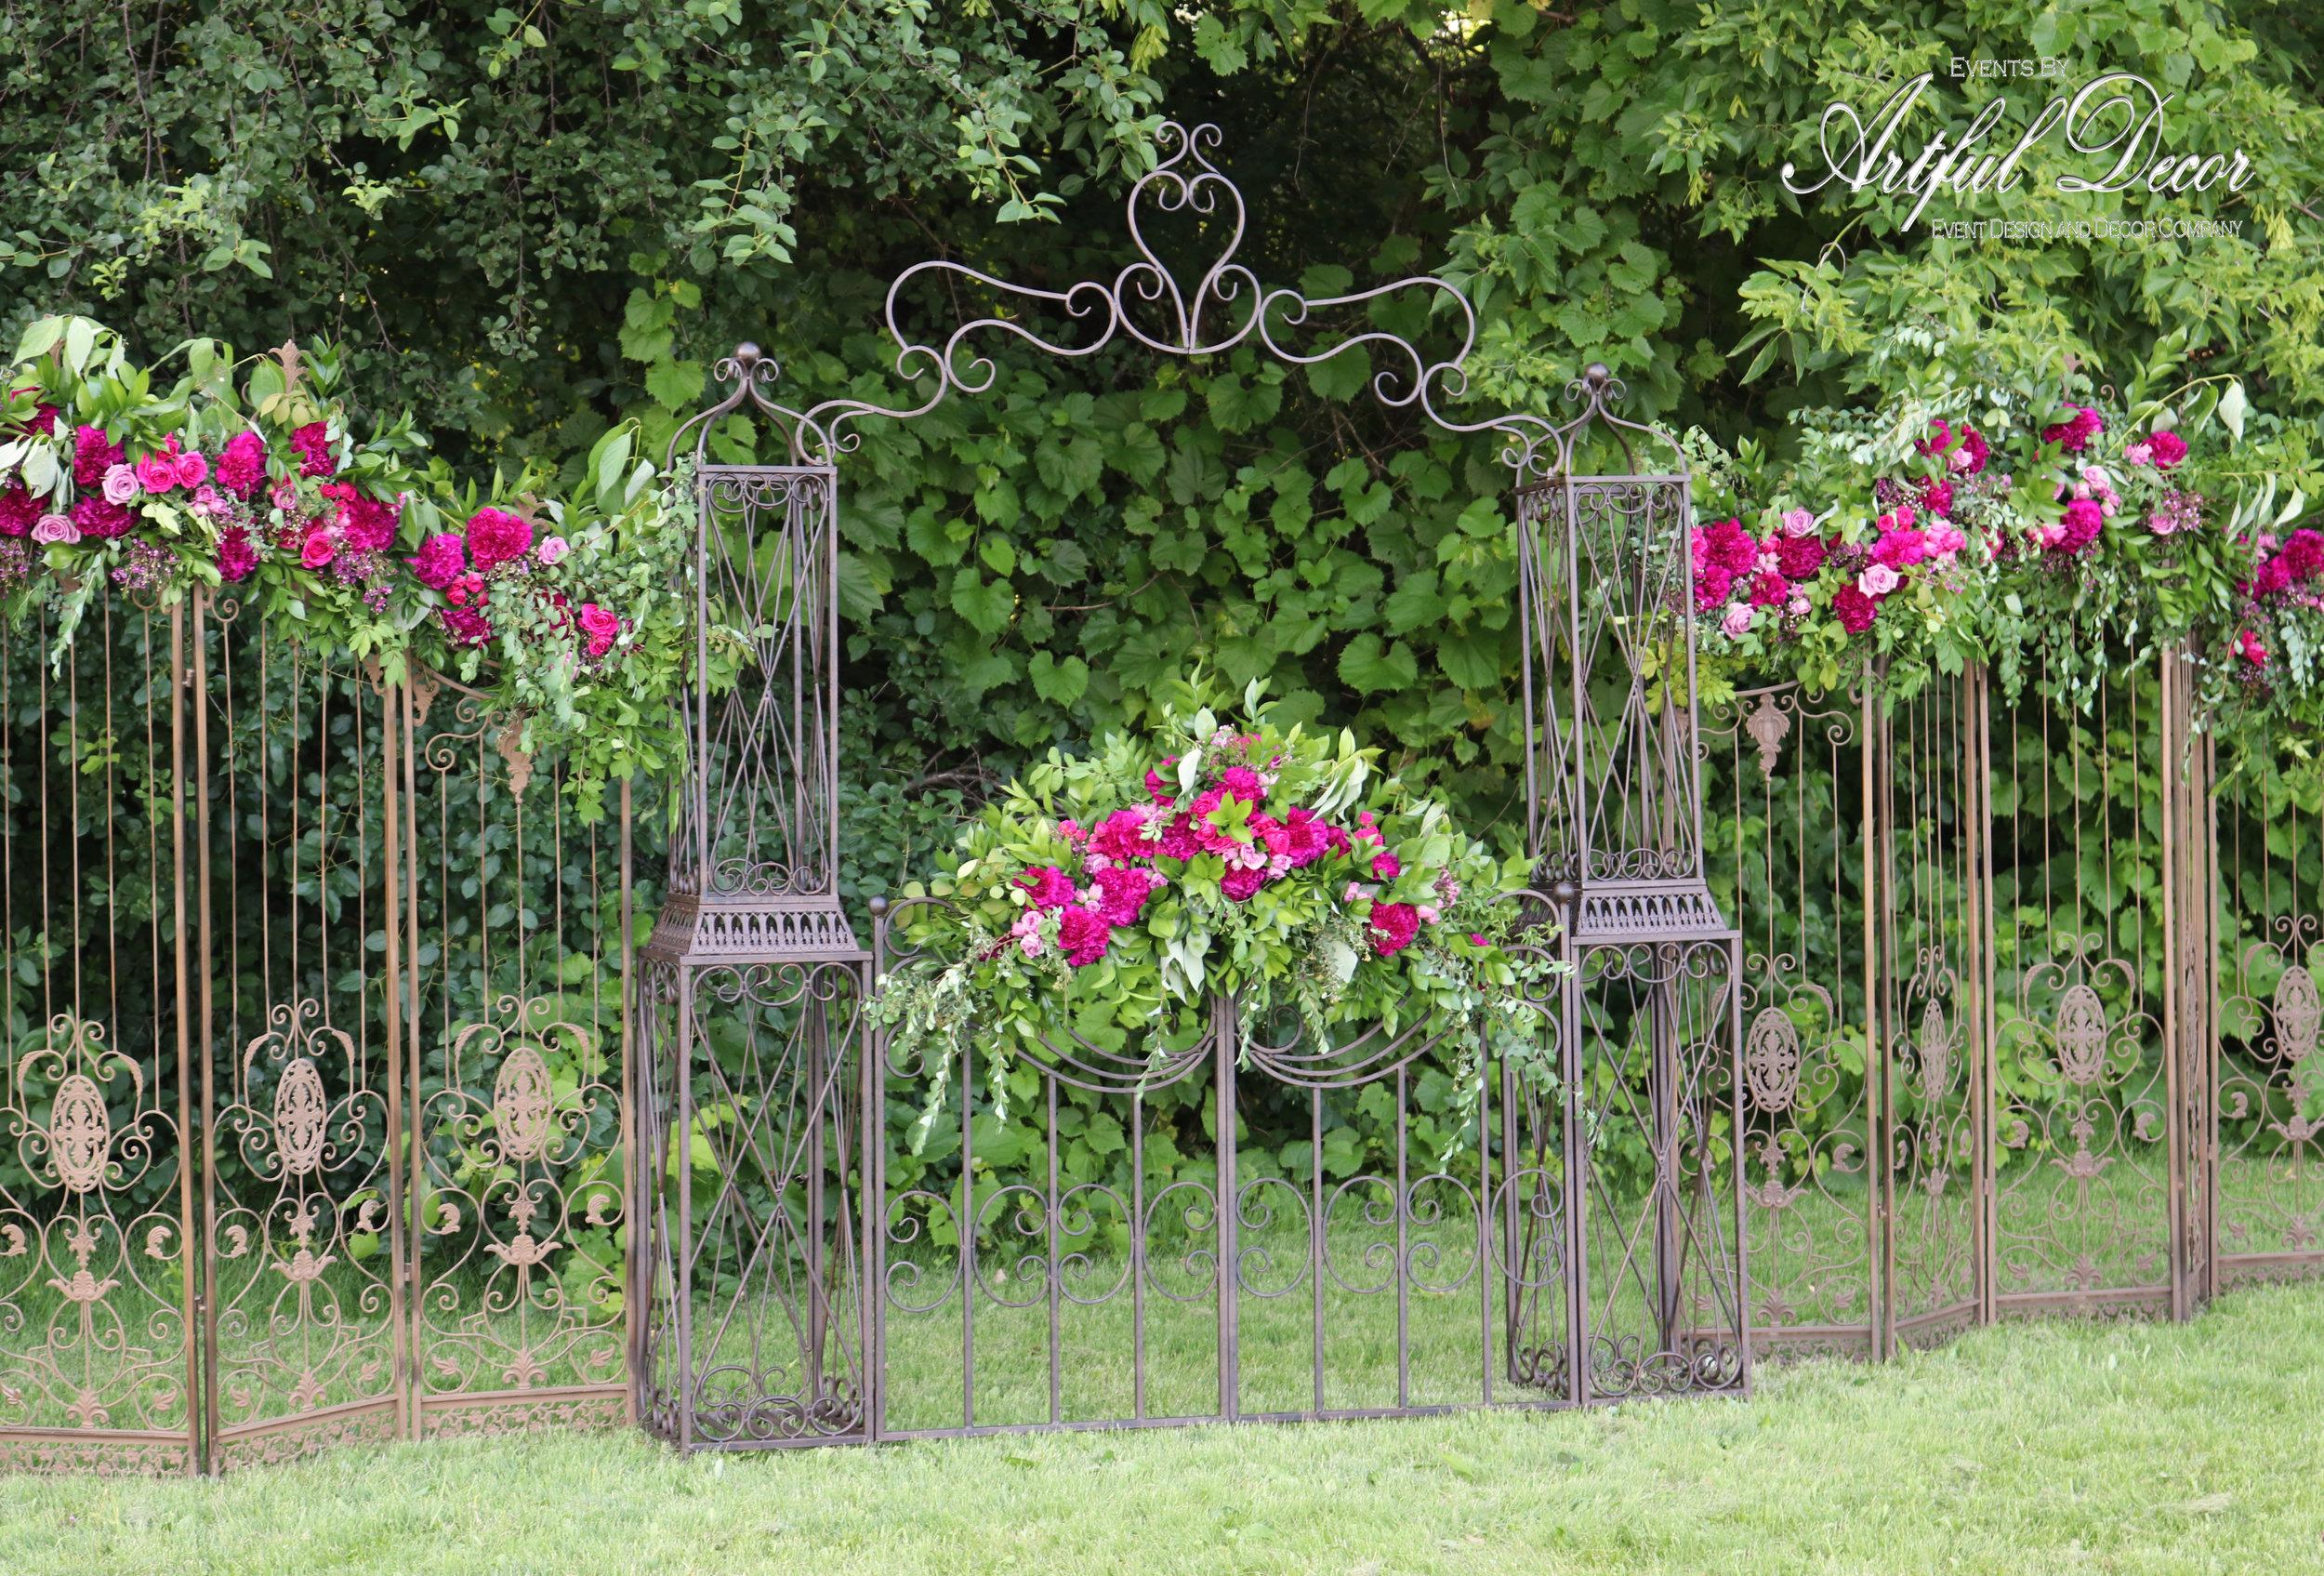 Garden Gate 15 Copyright.jpg